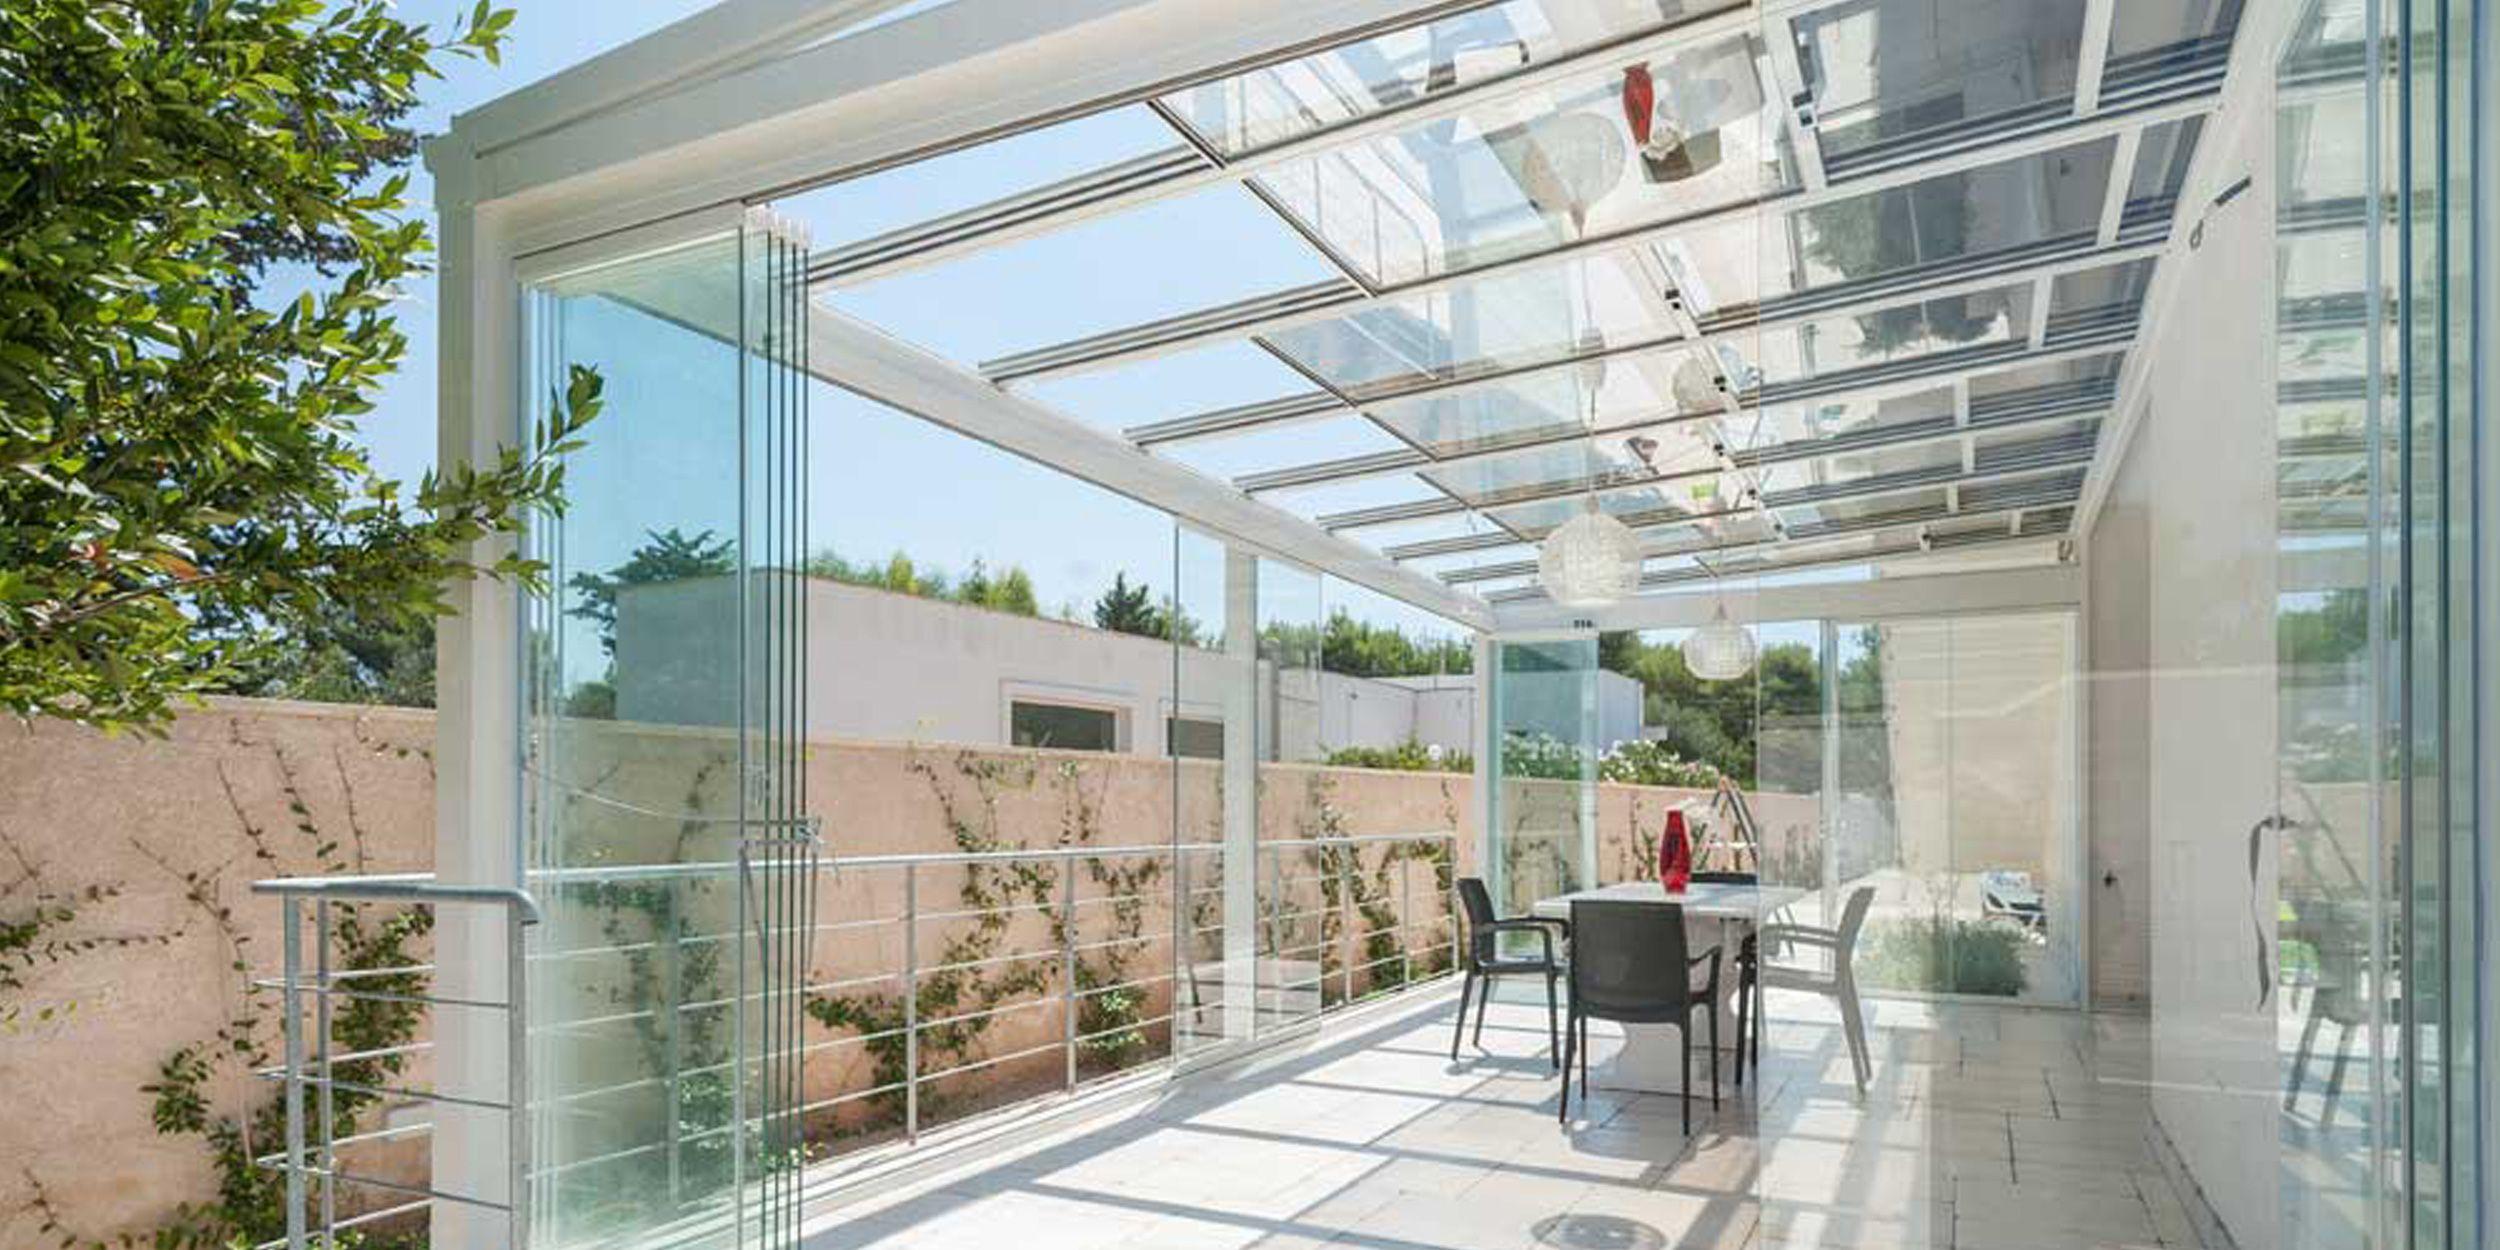 Coperture Gazebo In Policarbonato pin di lisa melis su casa   veranda, gazebo, tetto